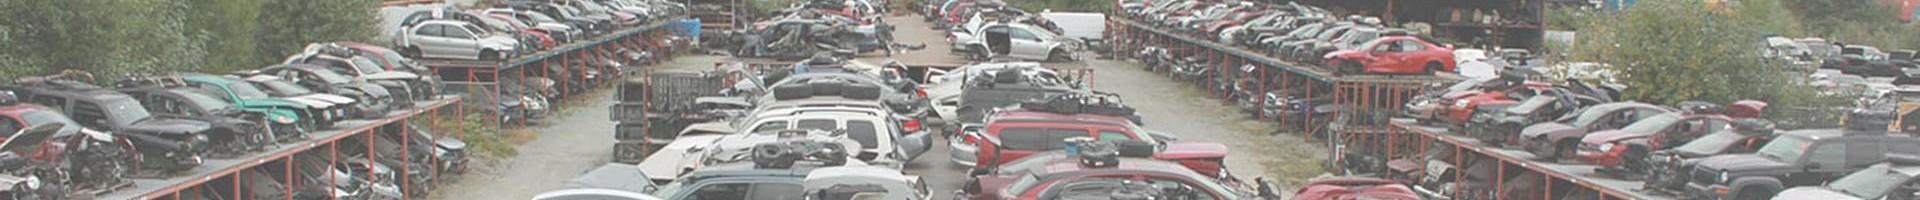 Reid's Car Yard